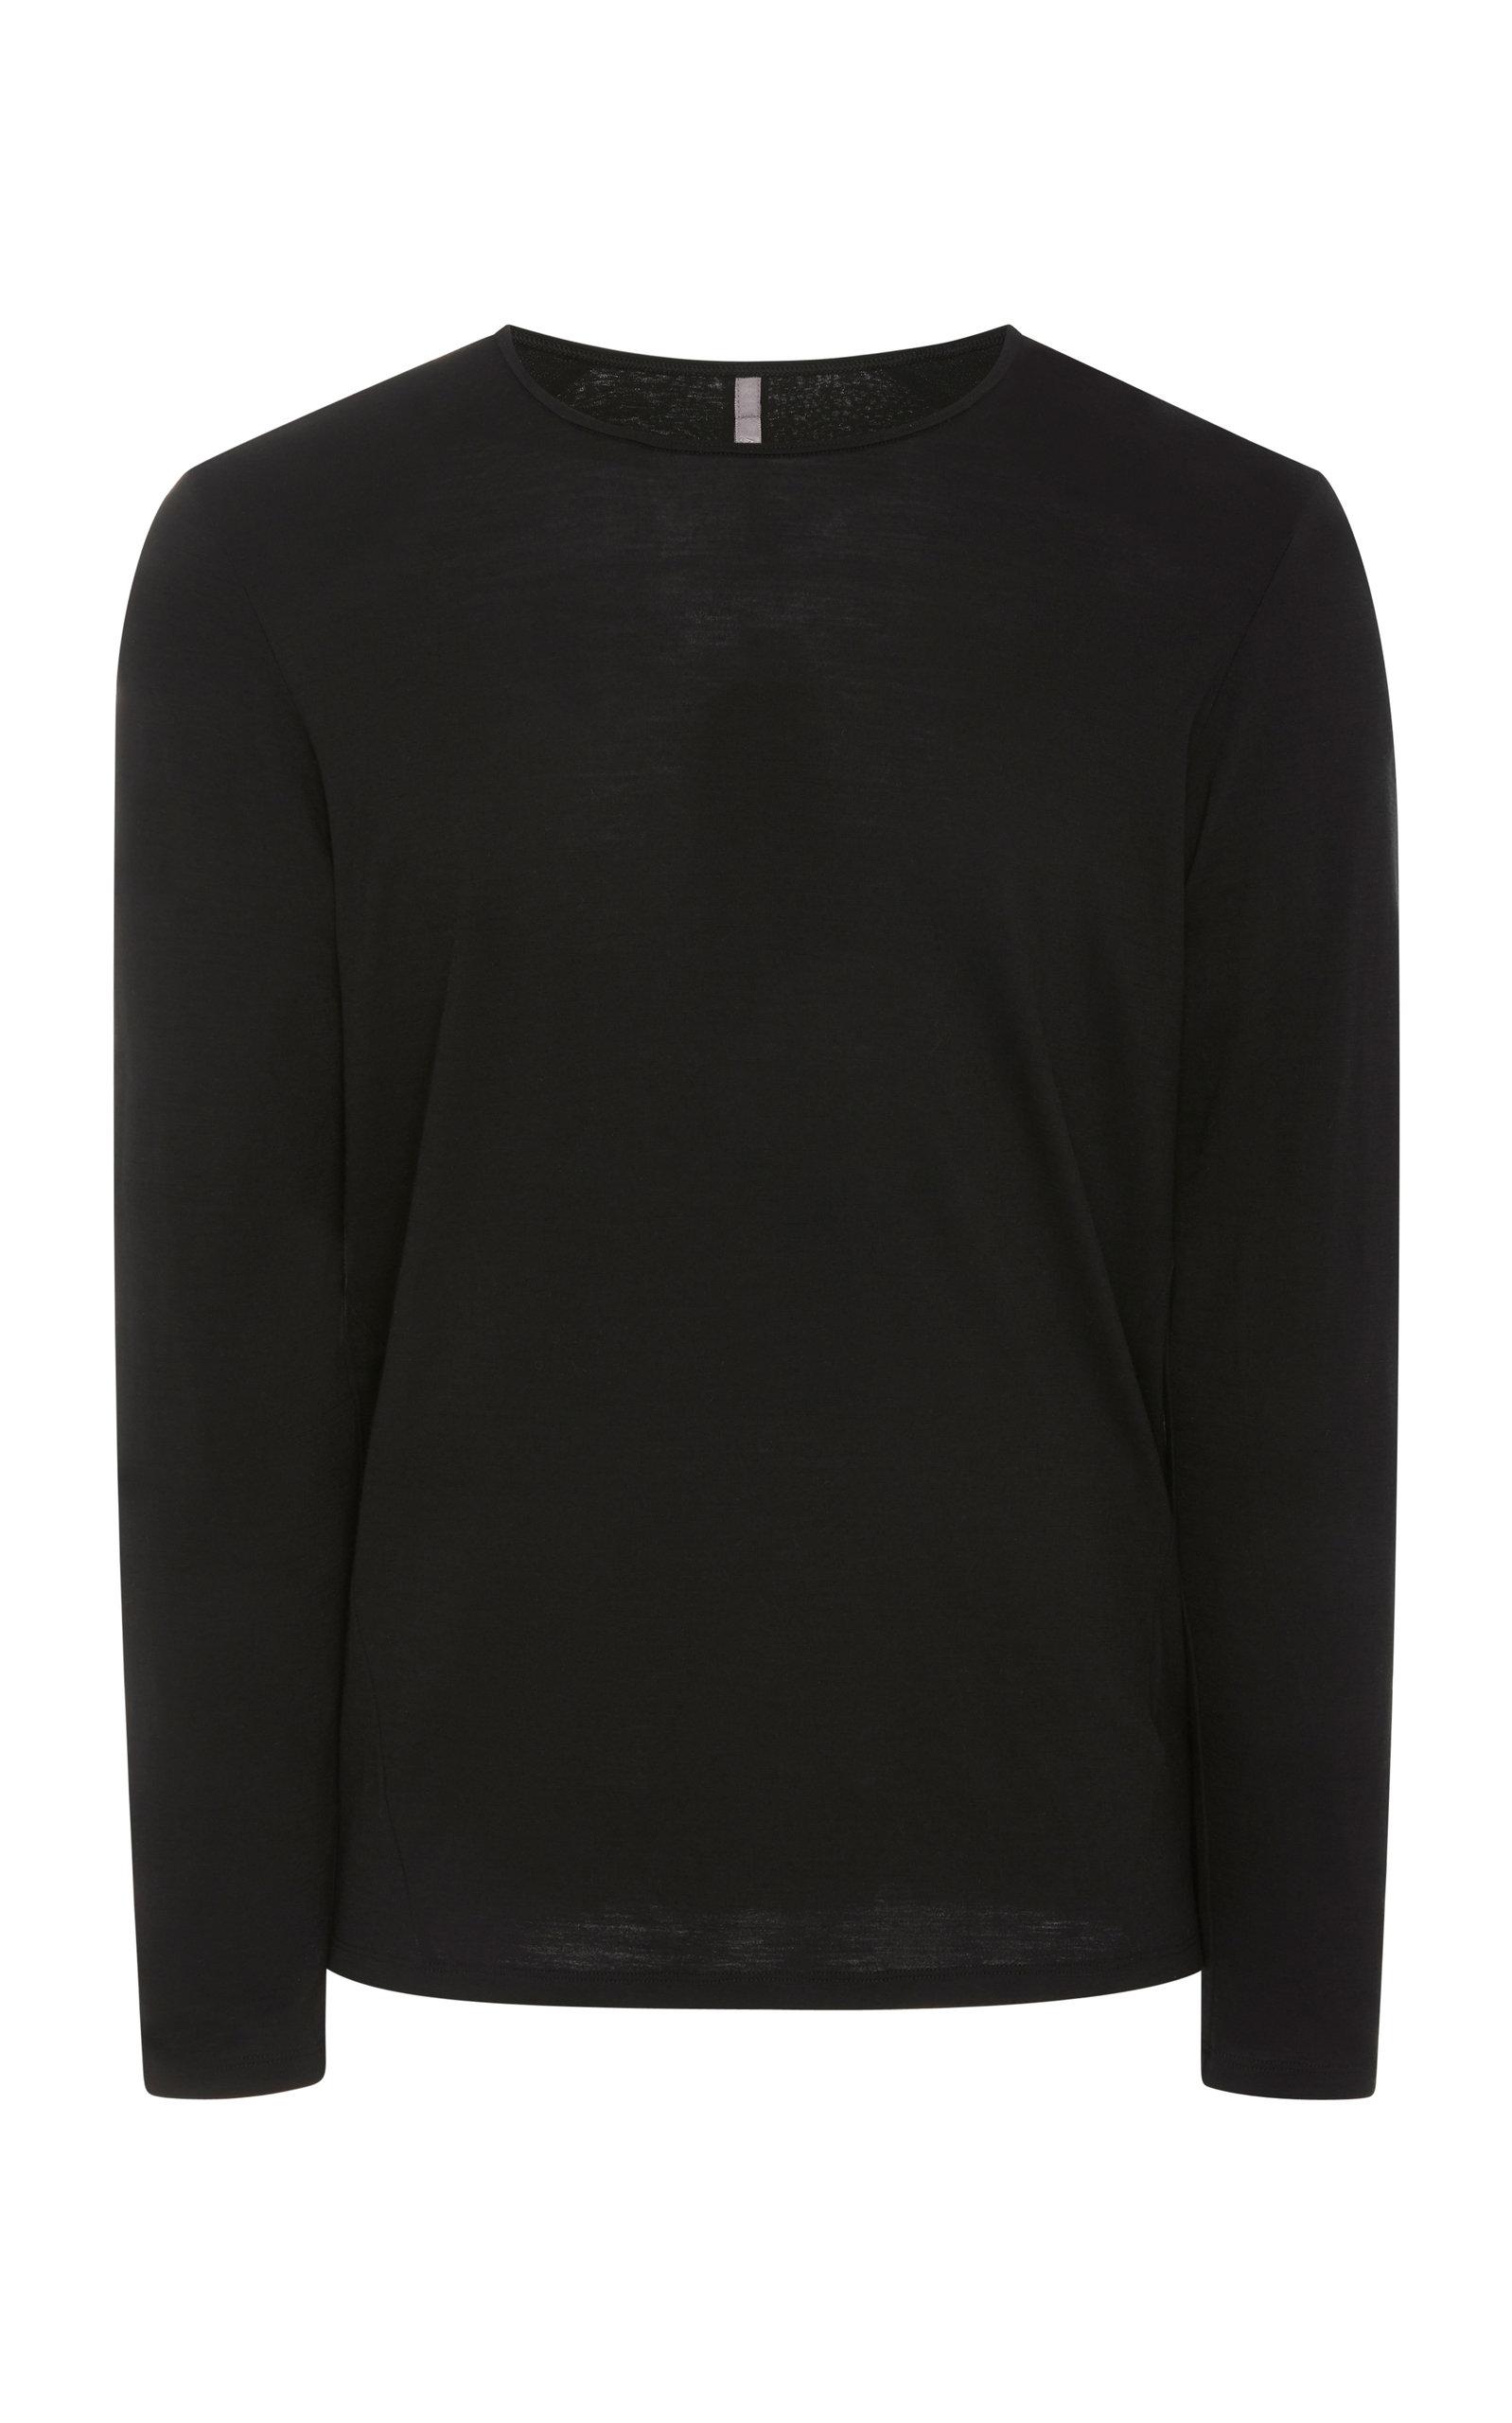 5f46dc95 Frame LS Merino Wool Jersey Shirt by Arc'teryx Veilance | Moda Operandi